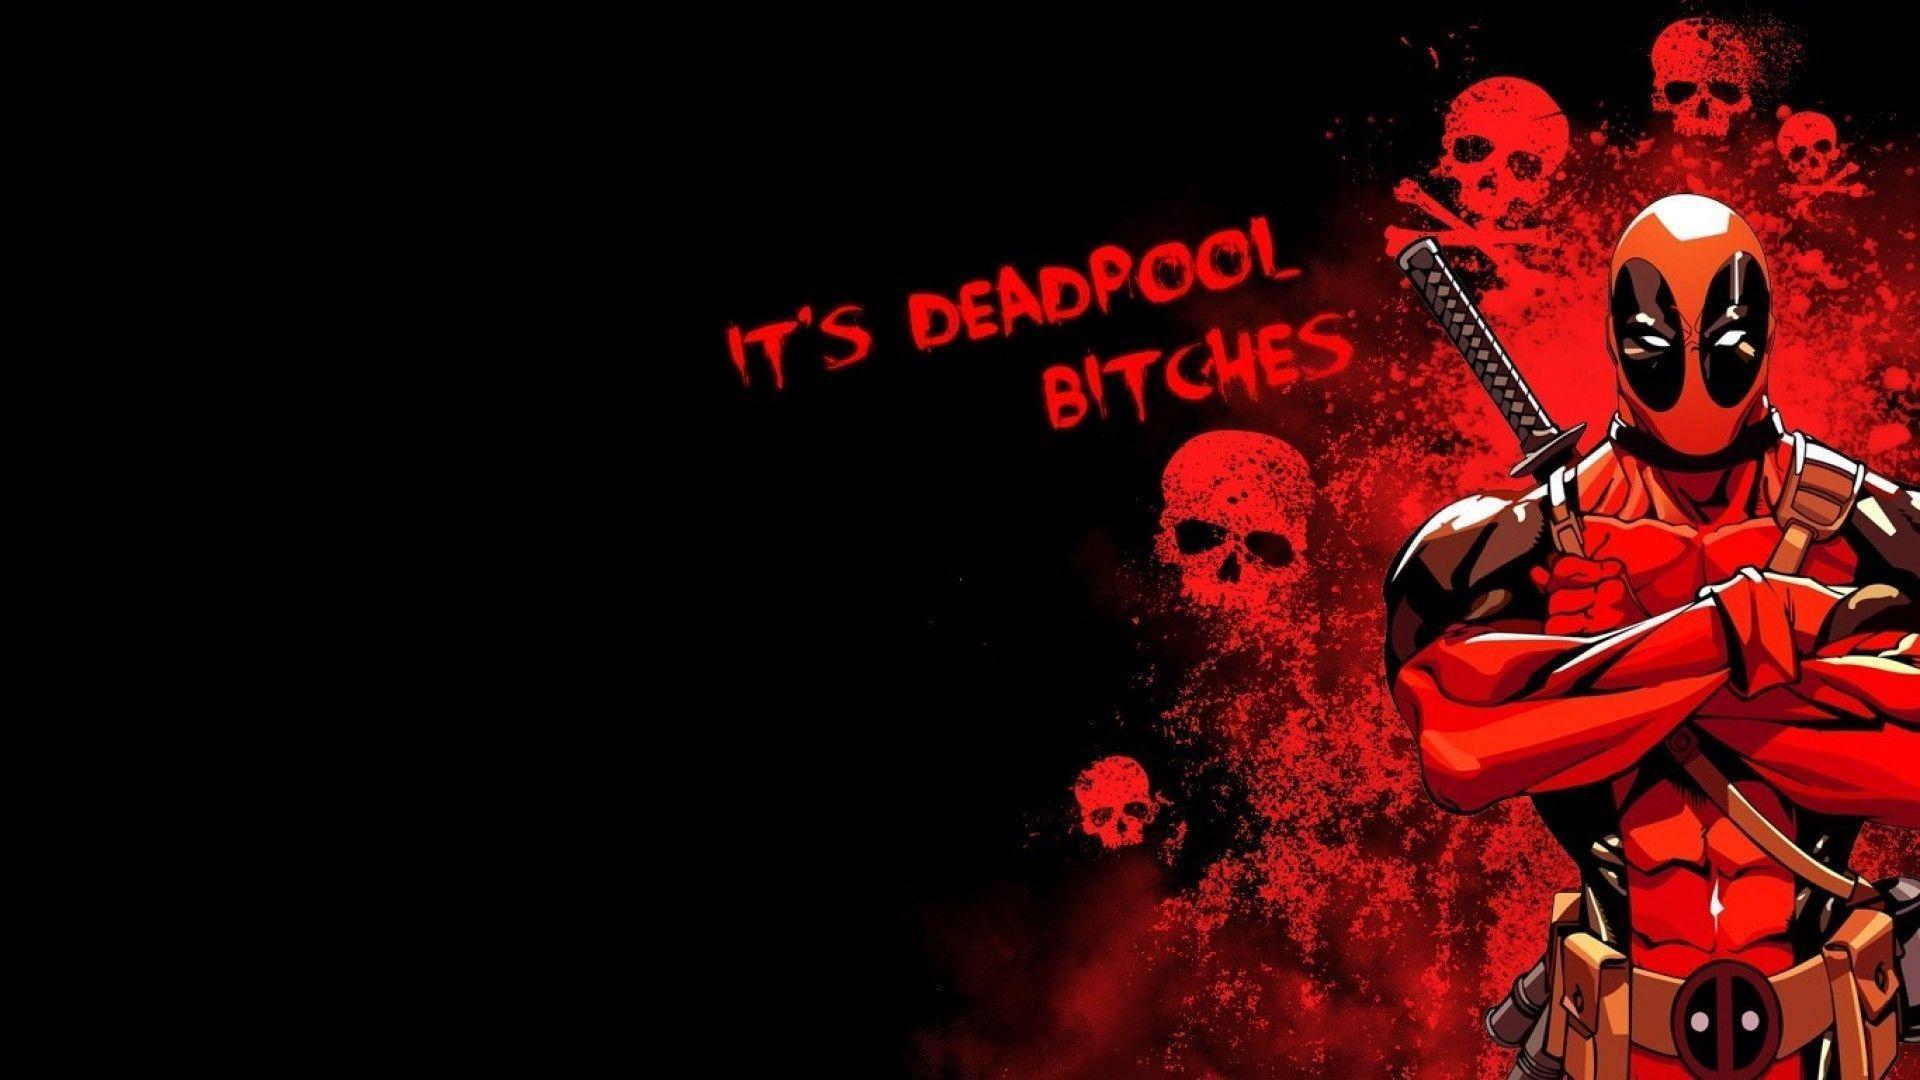 Hd 1024 Deadpool Laptop Wallpapers Top Free Hd 1024 Deadpool Laptop Backgrounds Wallpaperaccess